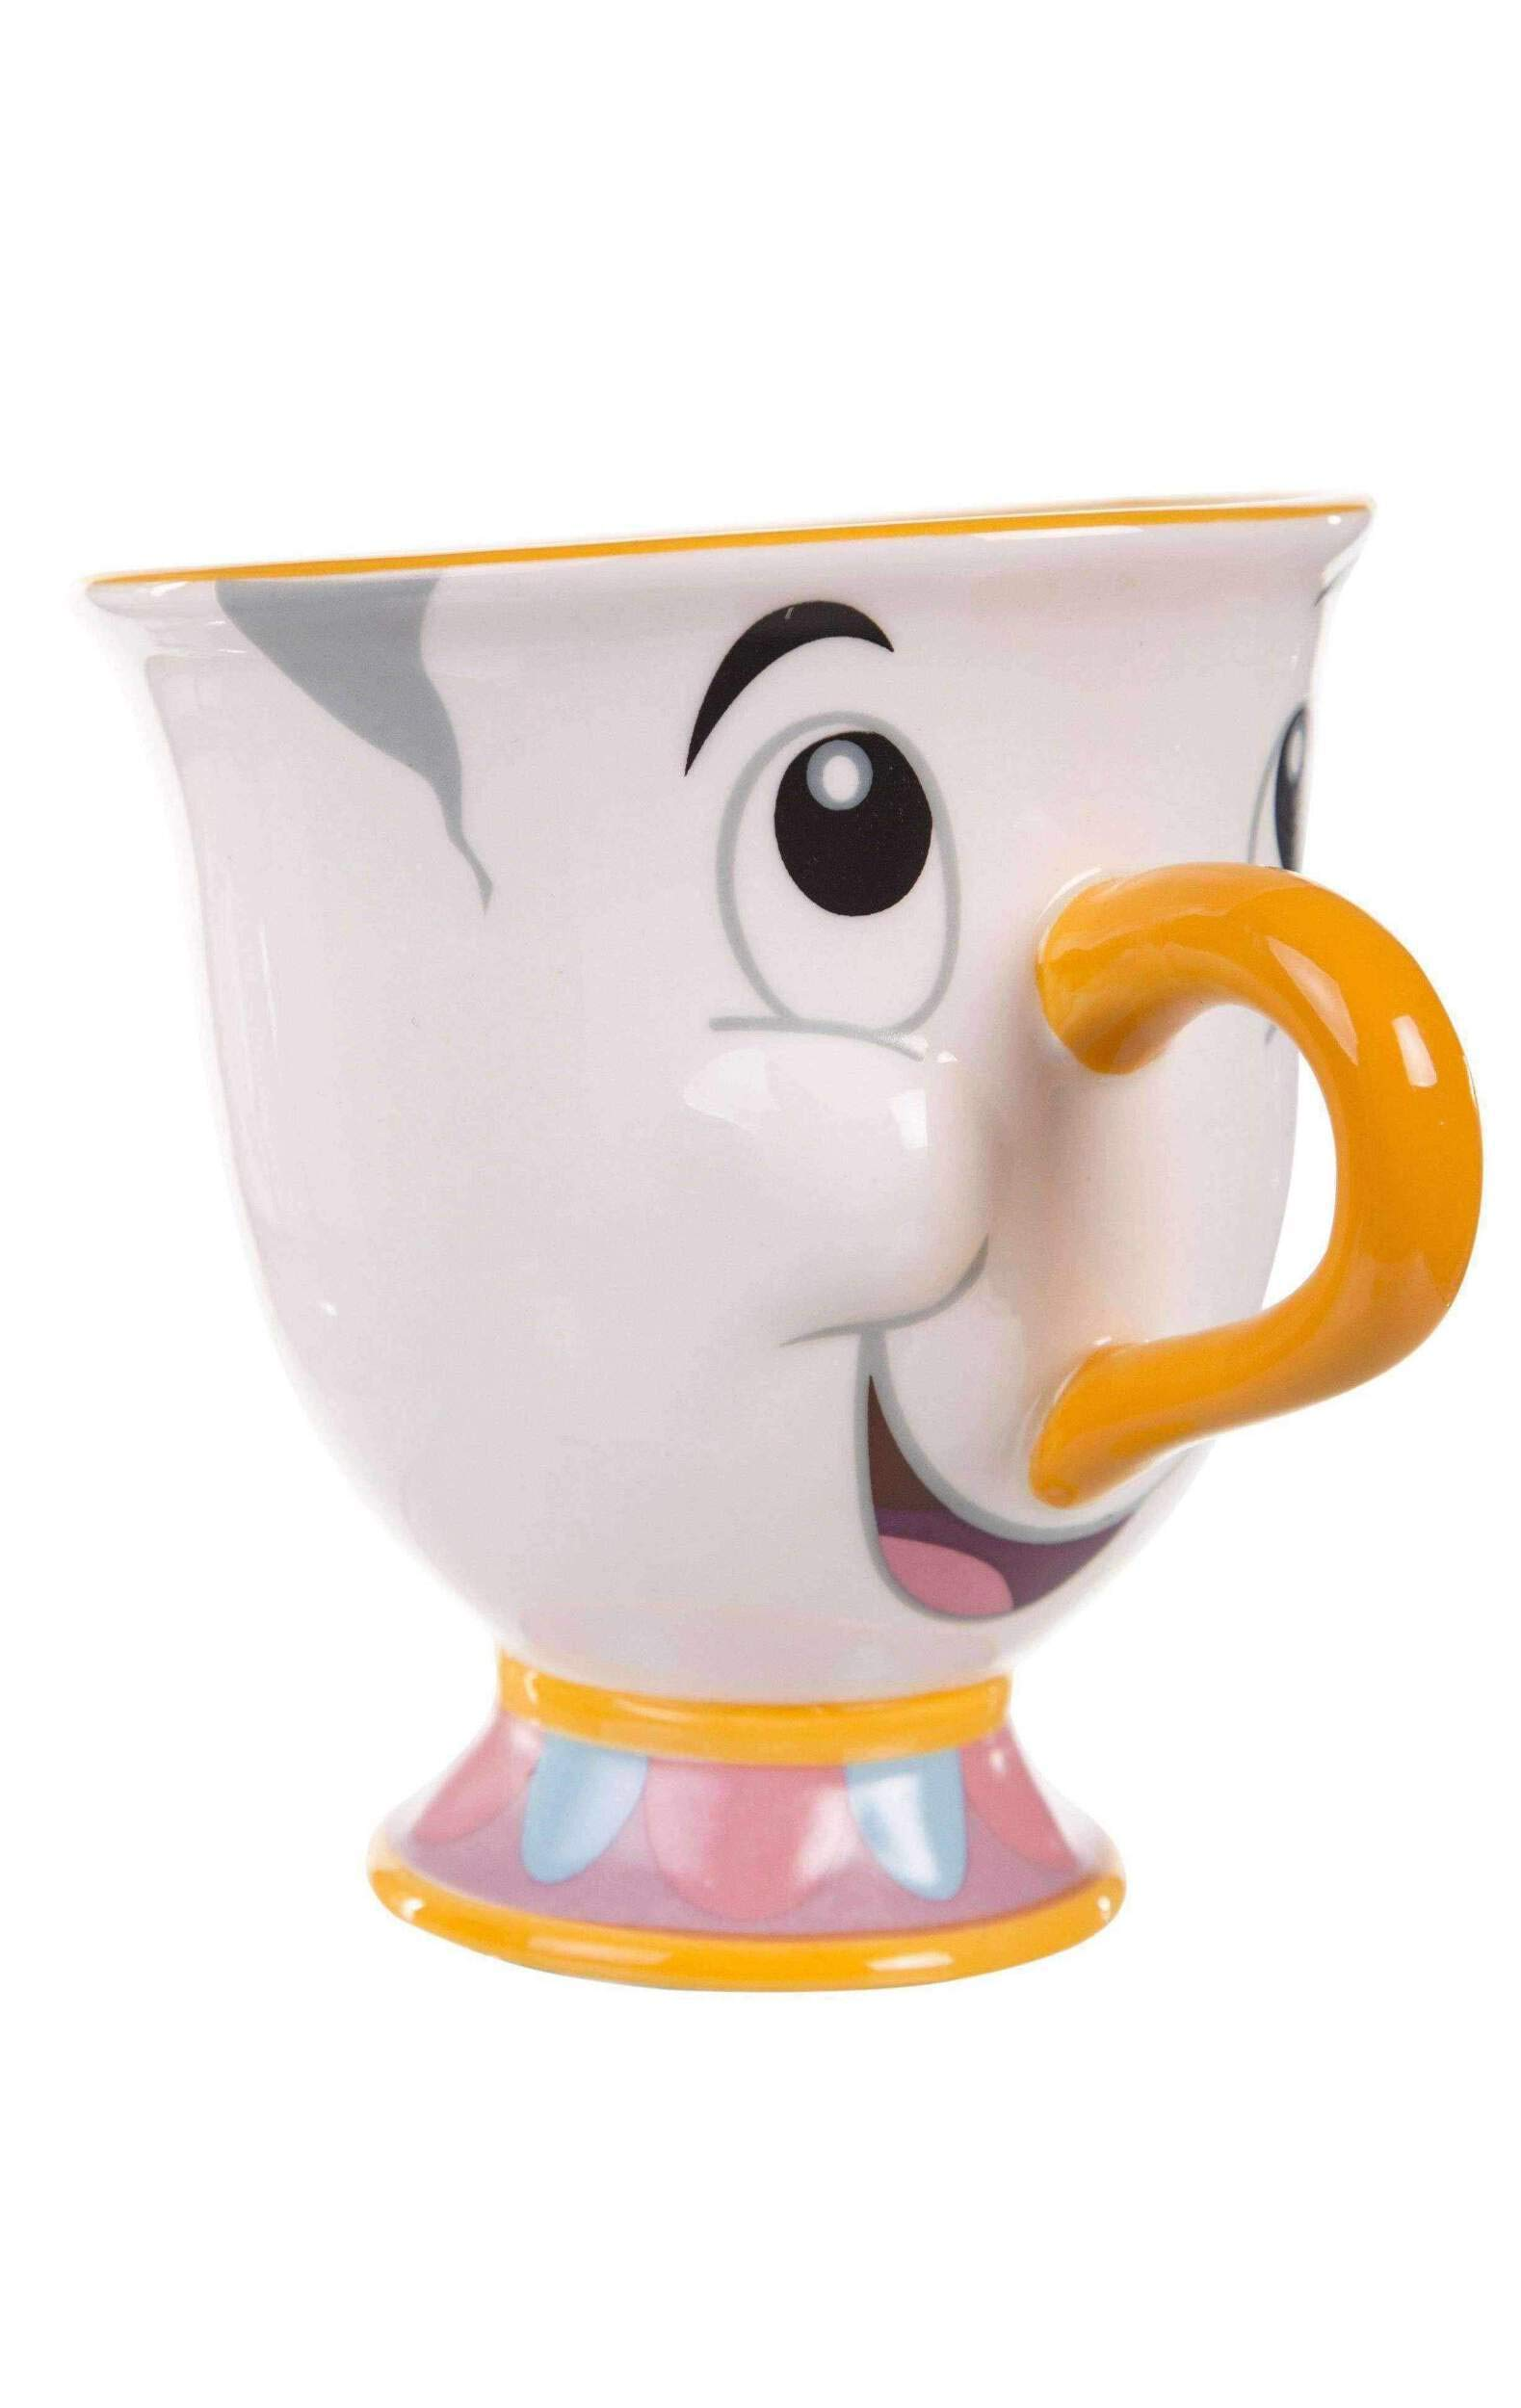 Disney Paladone Beauty and The Beast Chip Mug